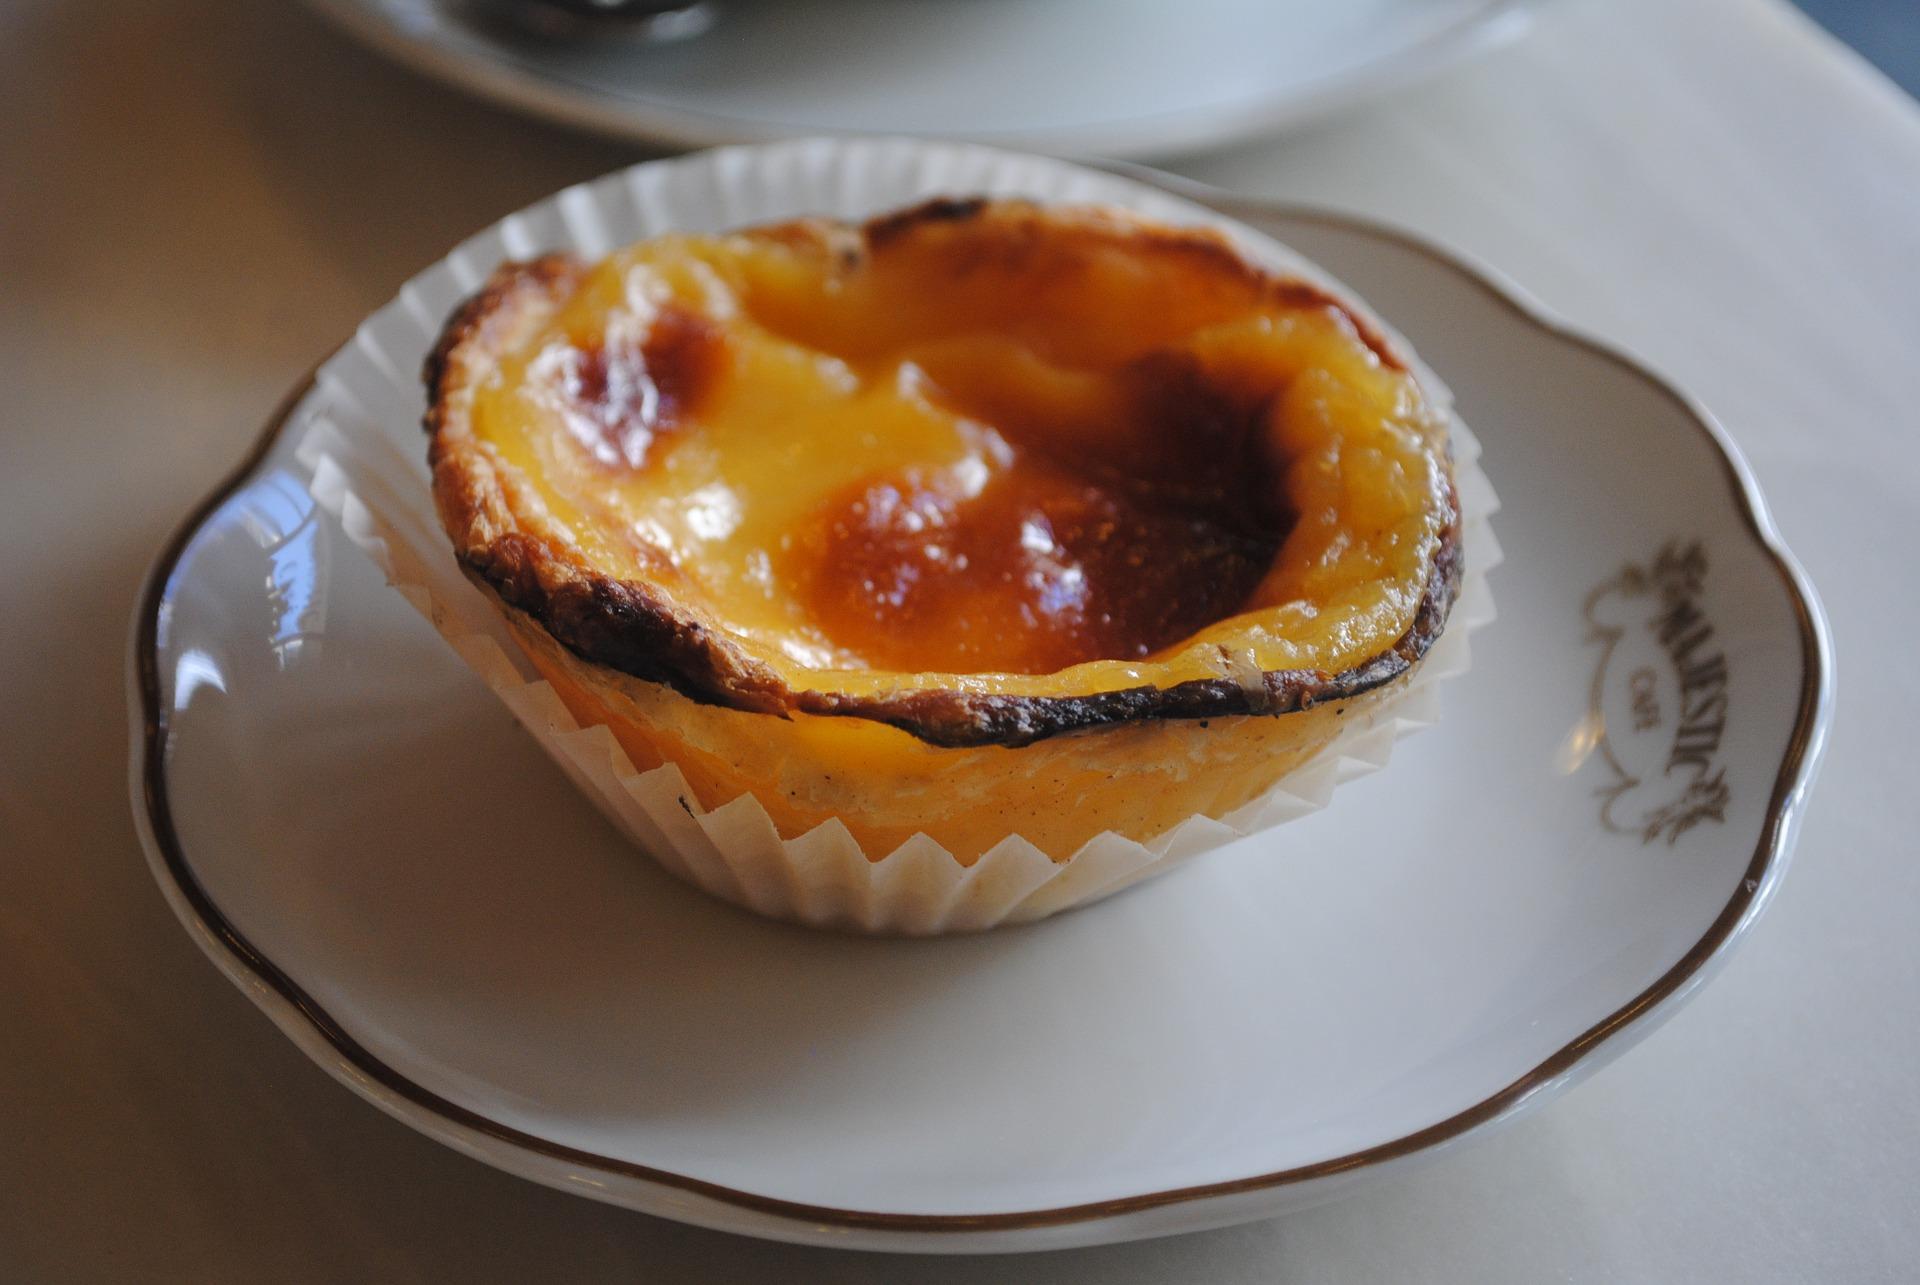 portuguese-custard-tart-758547_1920